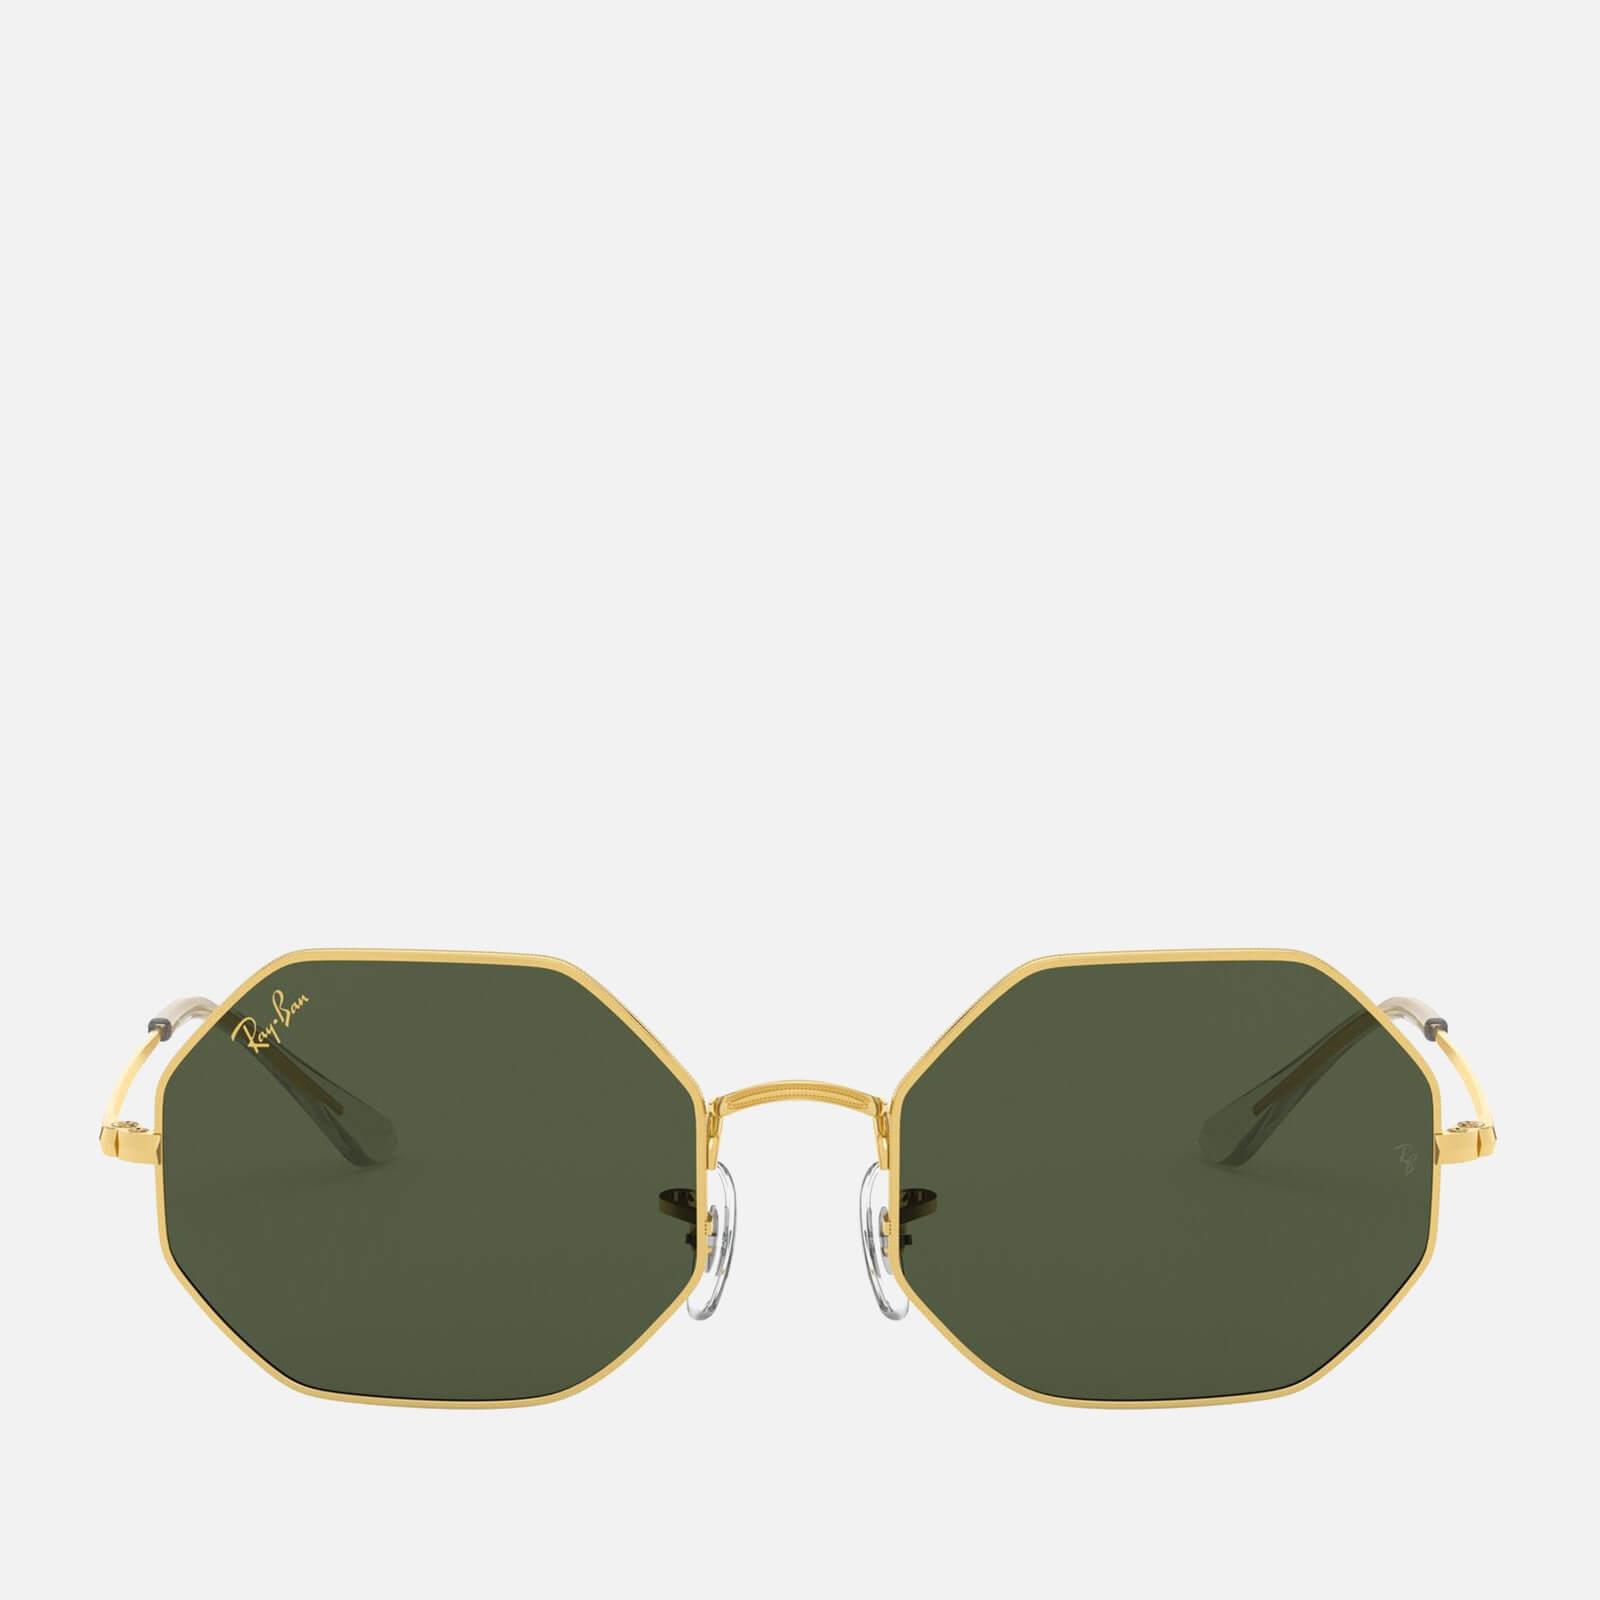 Ray-Ban Women's Octagonal Metal Sunglasses - Gold